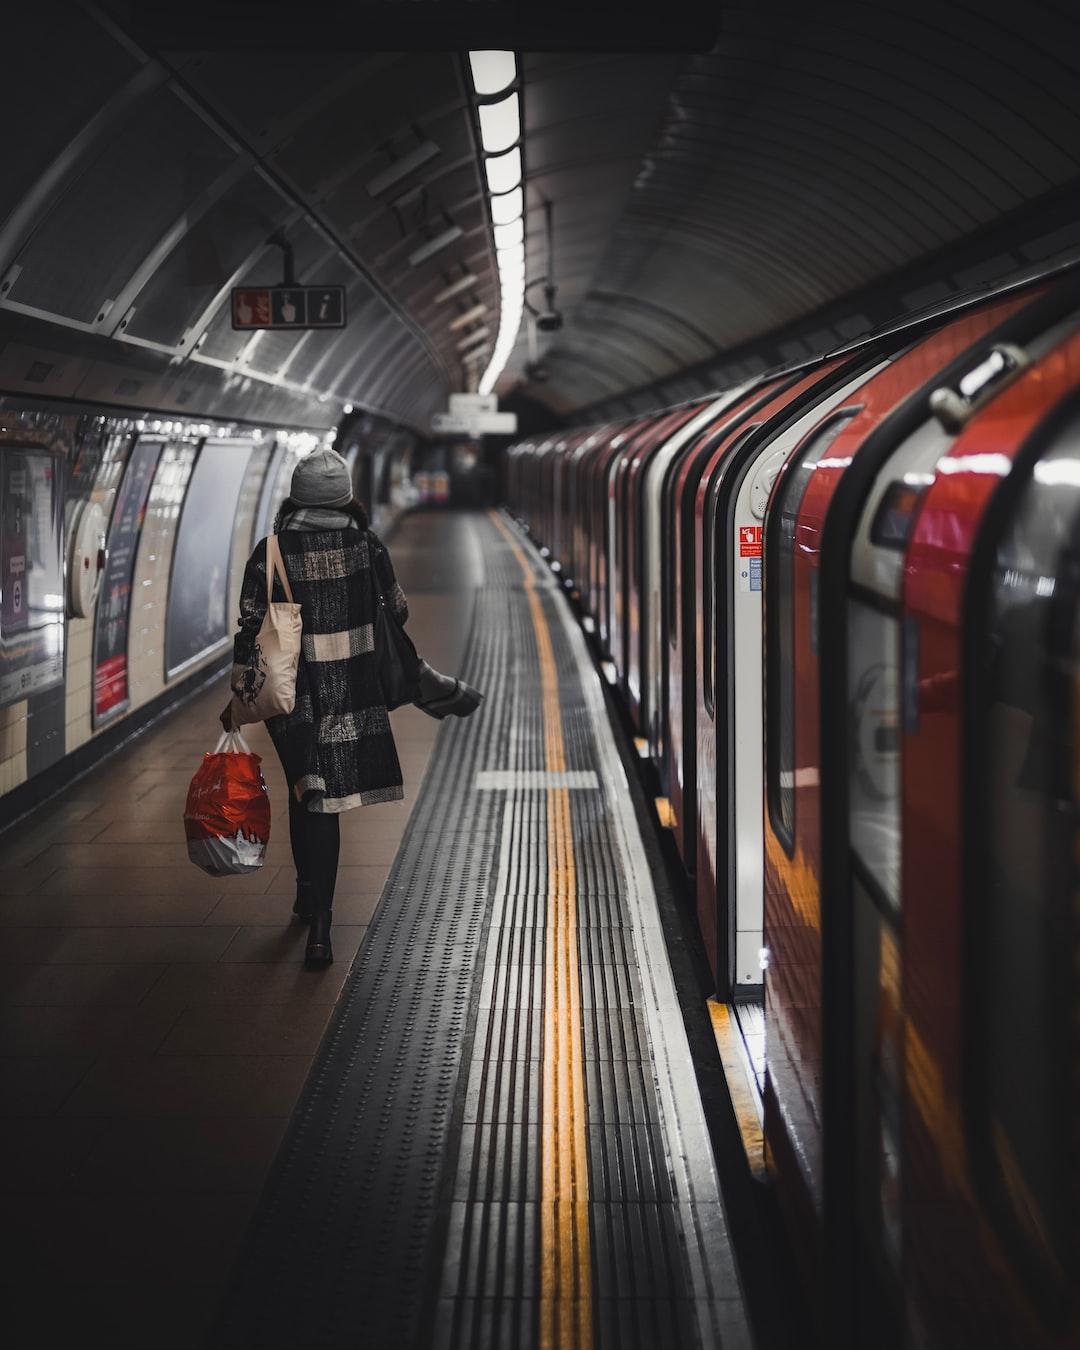 Brixton underground station, London